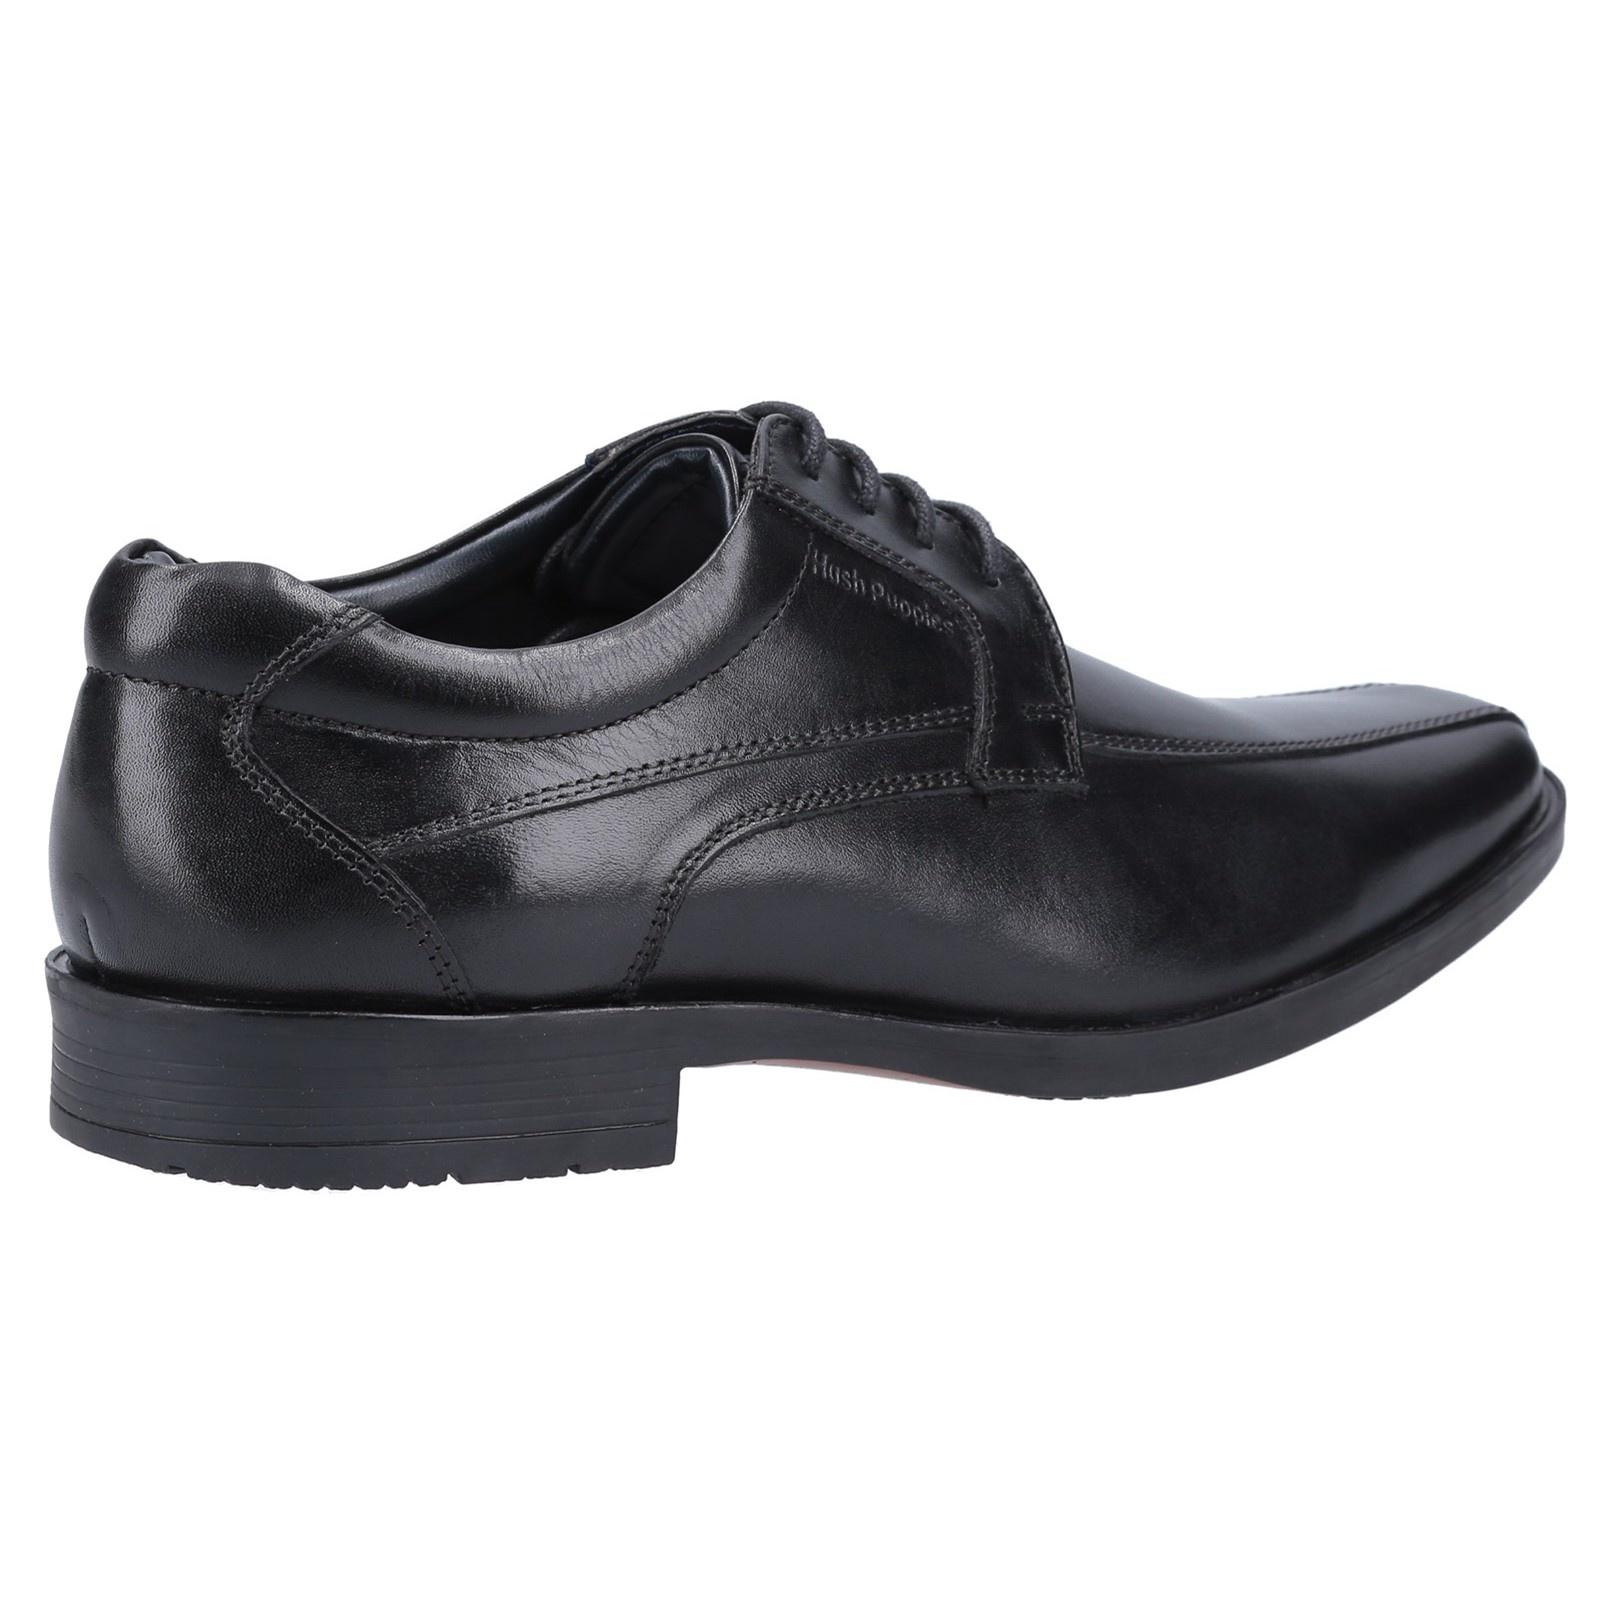 Hush Puppies Brandon Black Leather